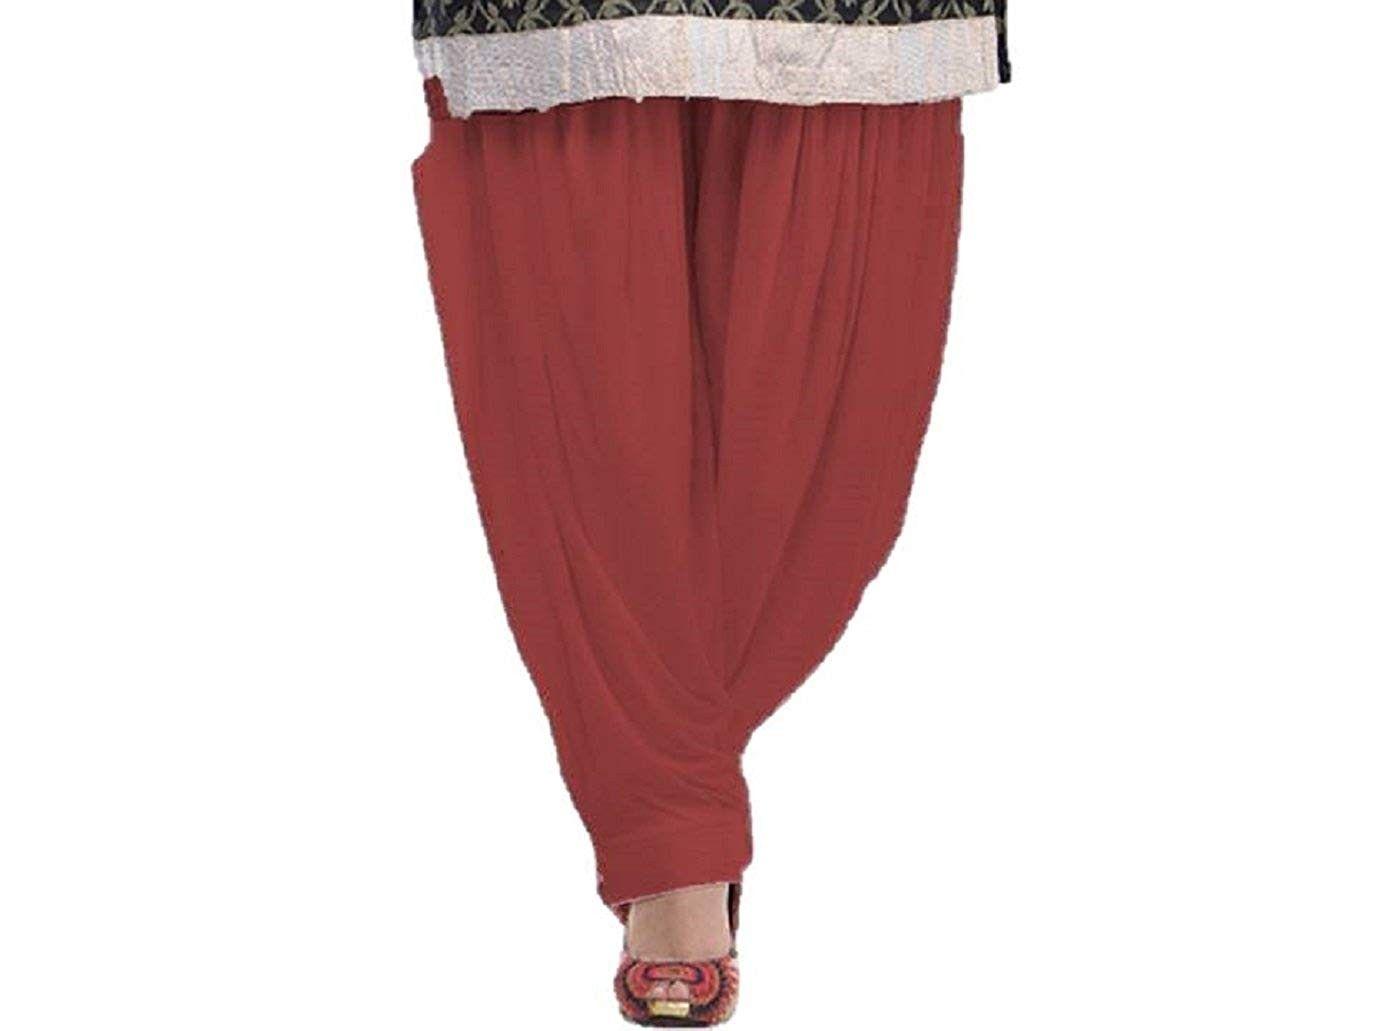 Patiala Salwar - Harem Pants - Yoga Pilates Pants 100% Cotton Free Style - Red - CT18E962WIN - Sport...